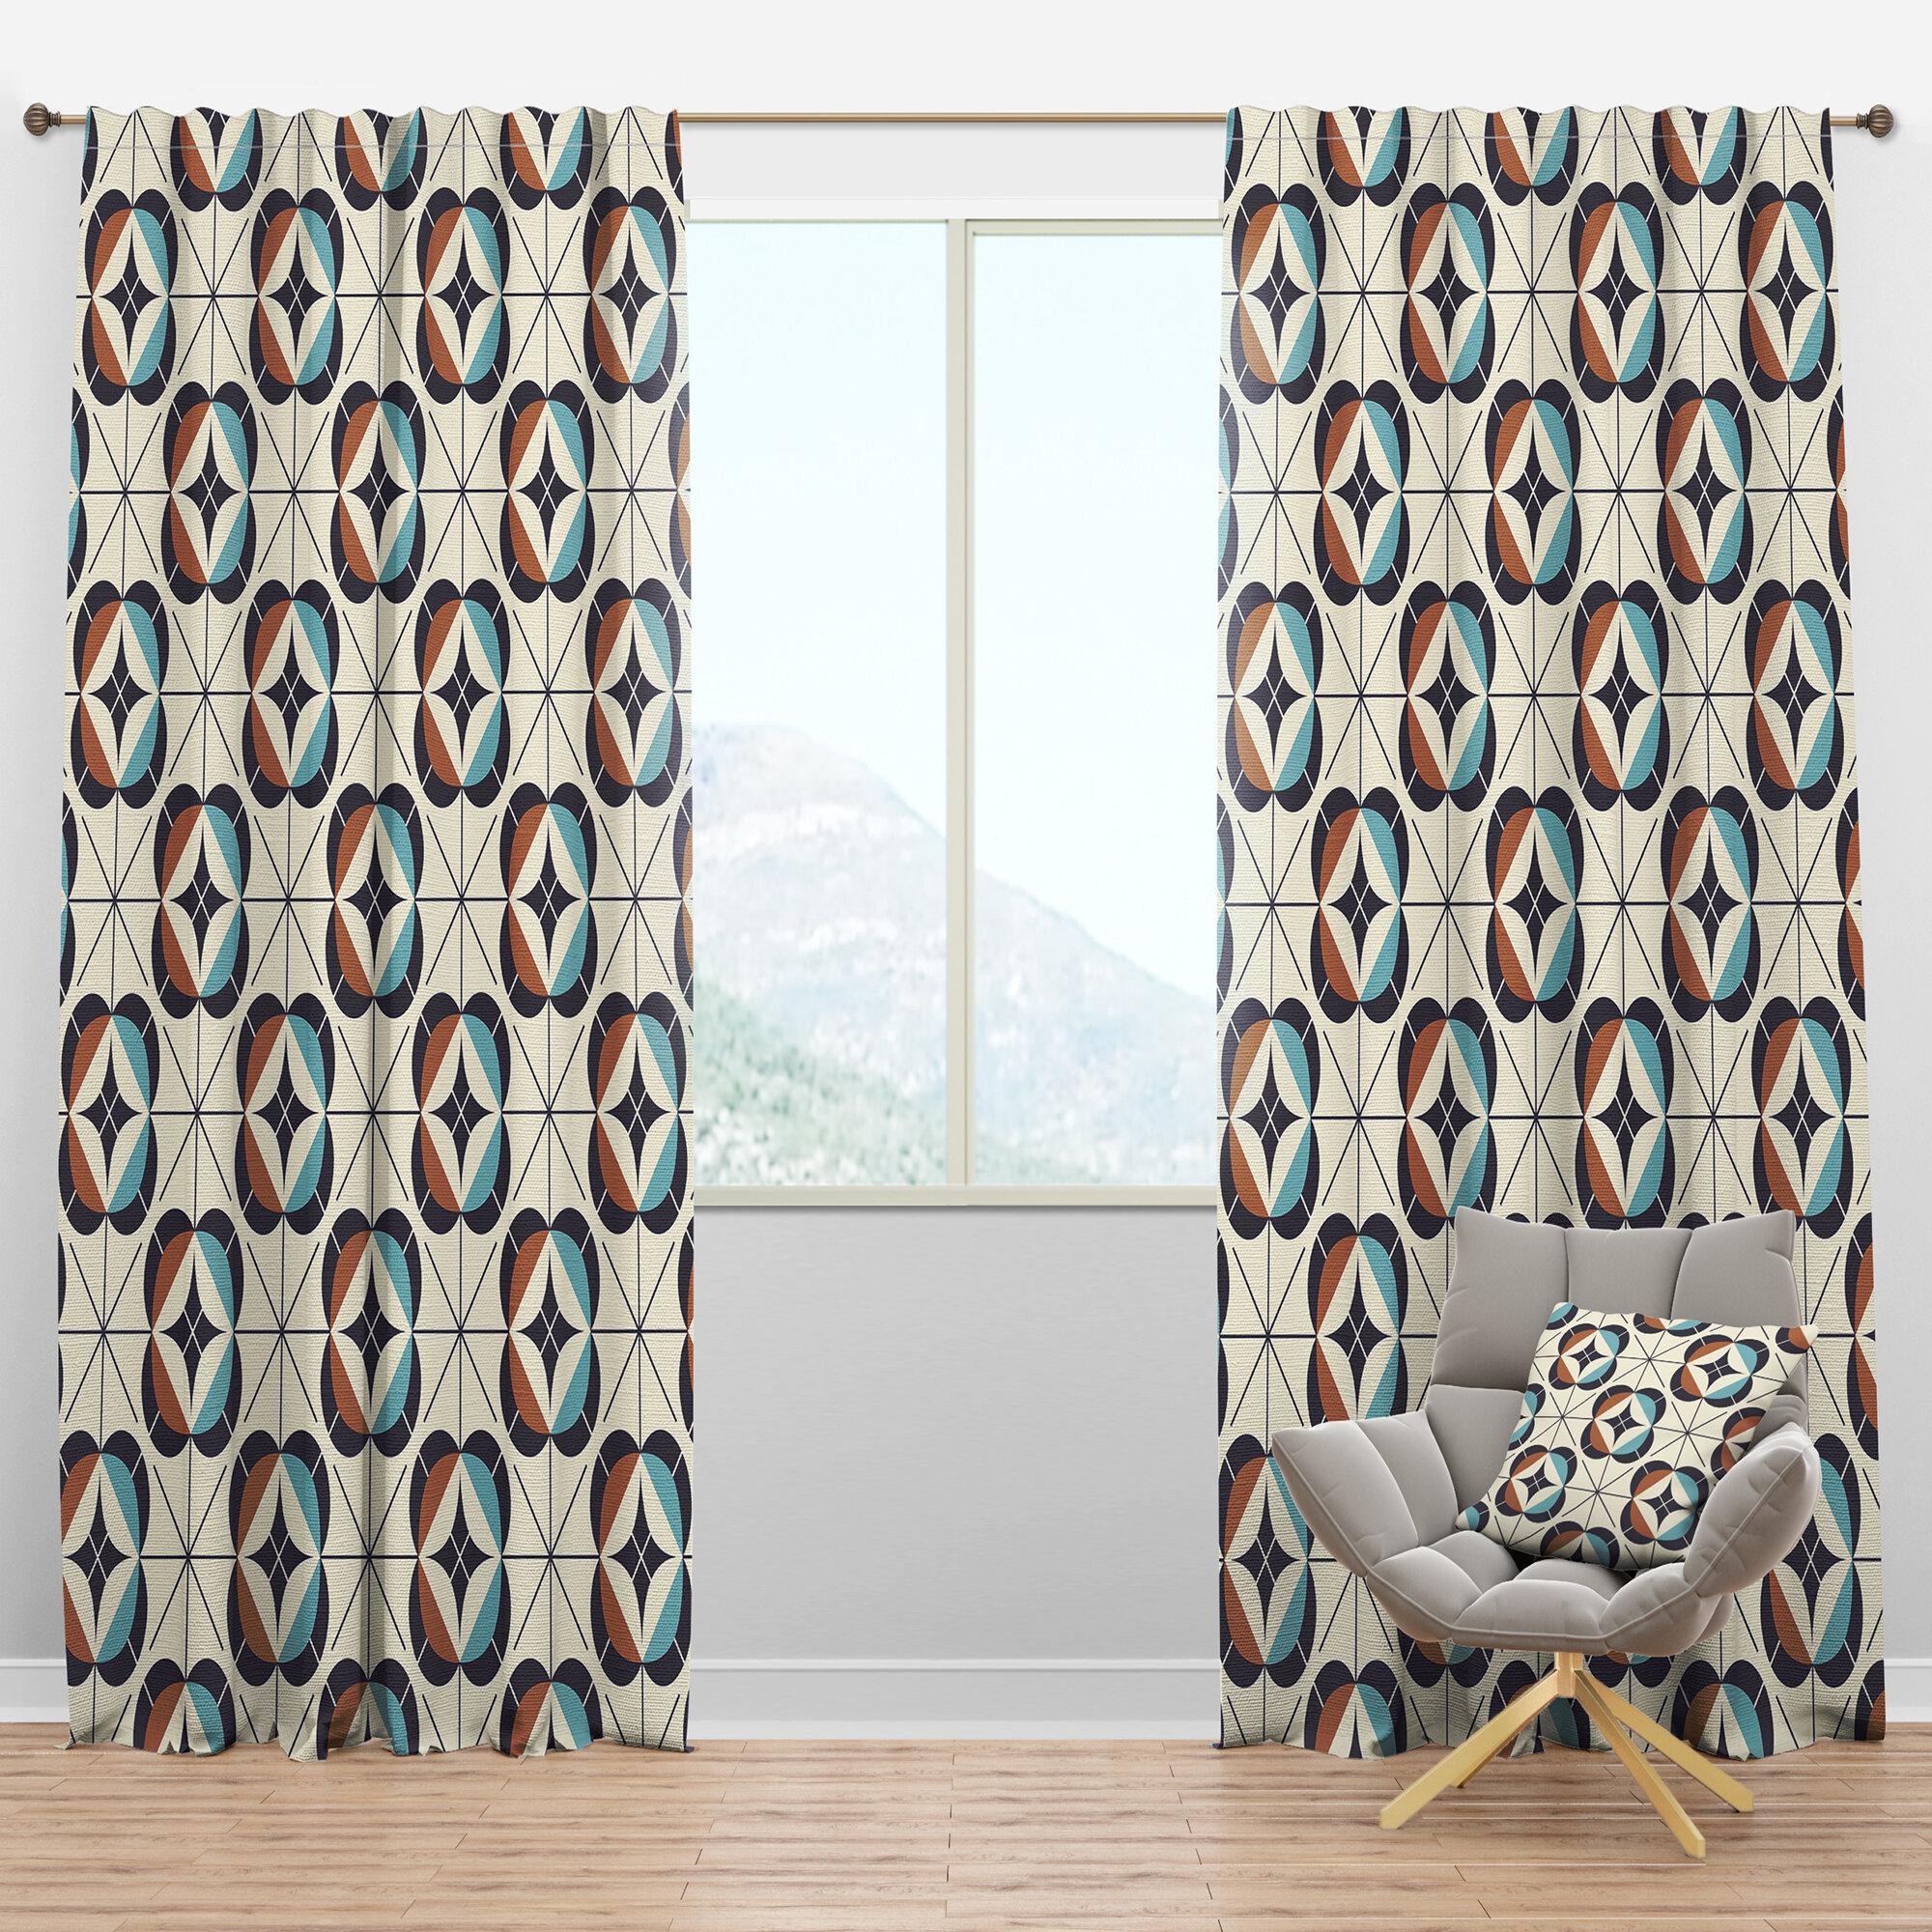 Designart Mid Century Design V Geometric Semi Sheer Thermal Rod Pocket Single Curtain Panels Wayfair